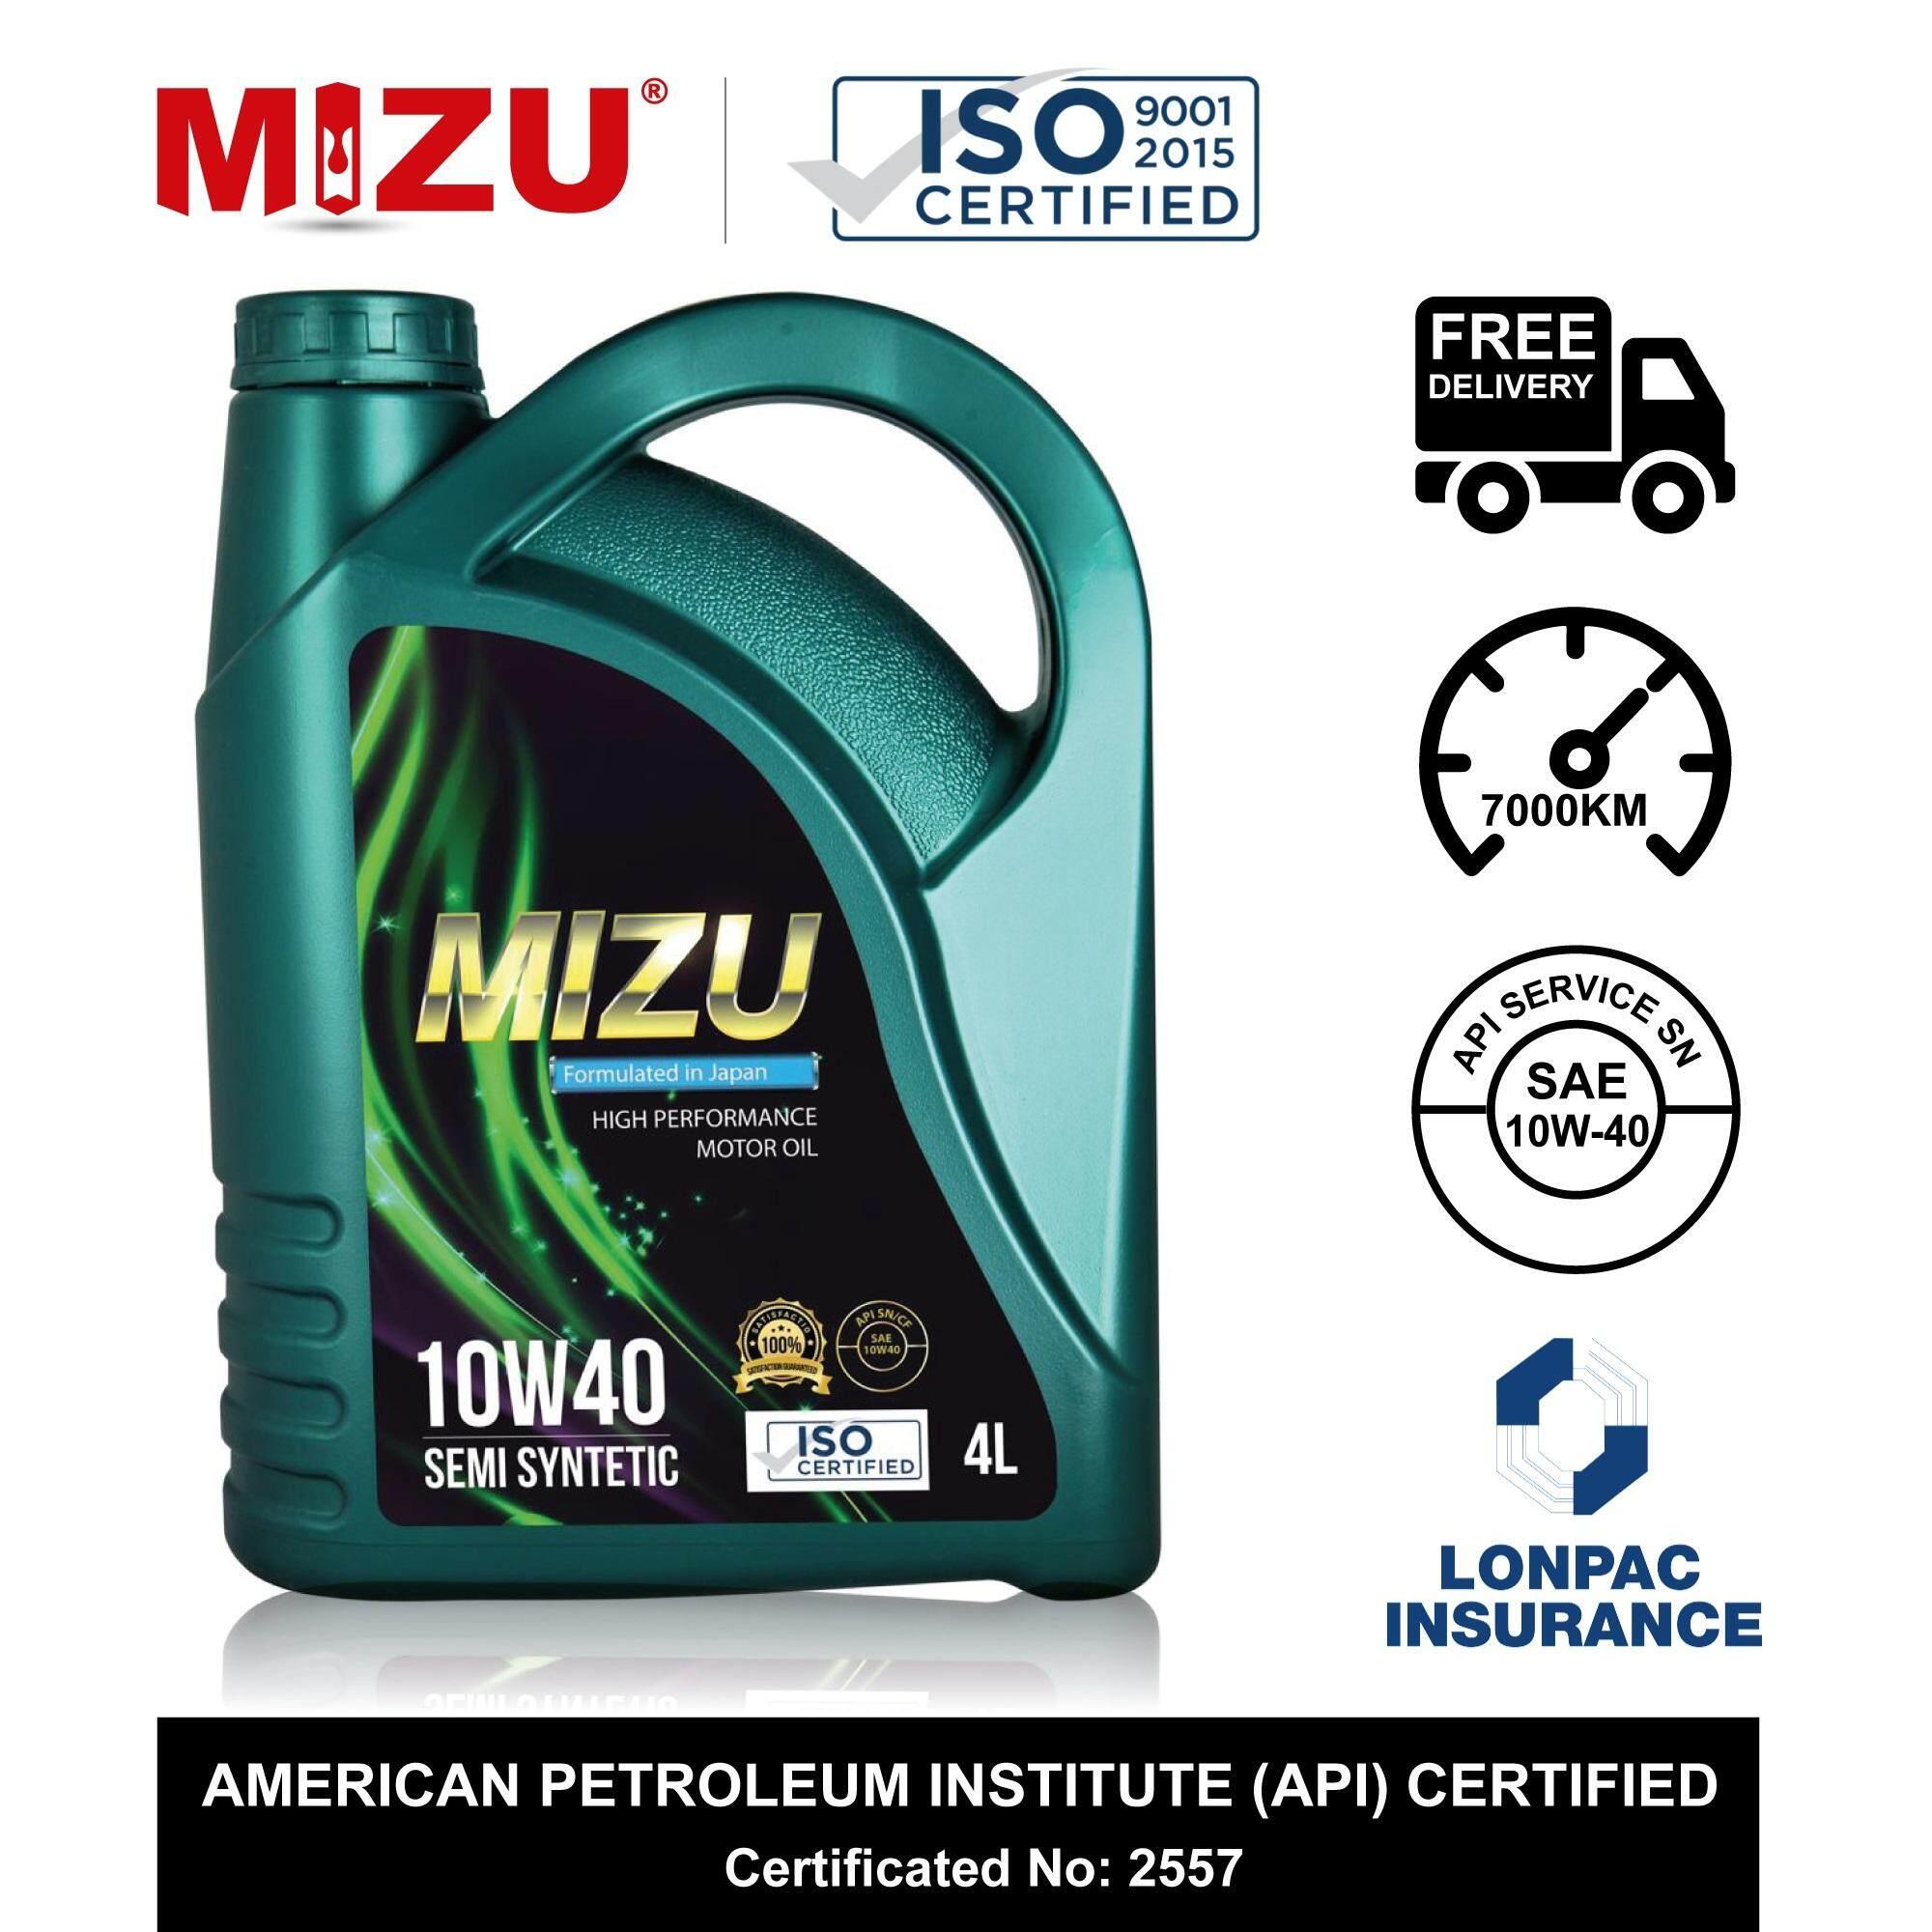 [FREE SHIPMENT ] Mizu Semi Synthetic Lubricant API SN 10W-40 Car Engine Oil  - 4 litres [Free 1 piece MIZU mileage sticker] 10w40 minyak hitam minyak